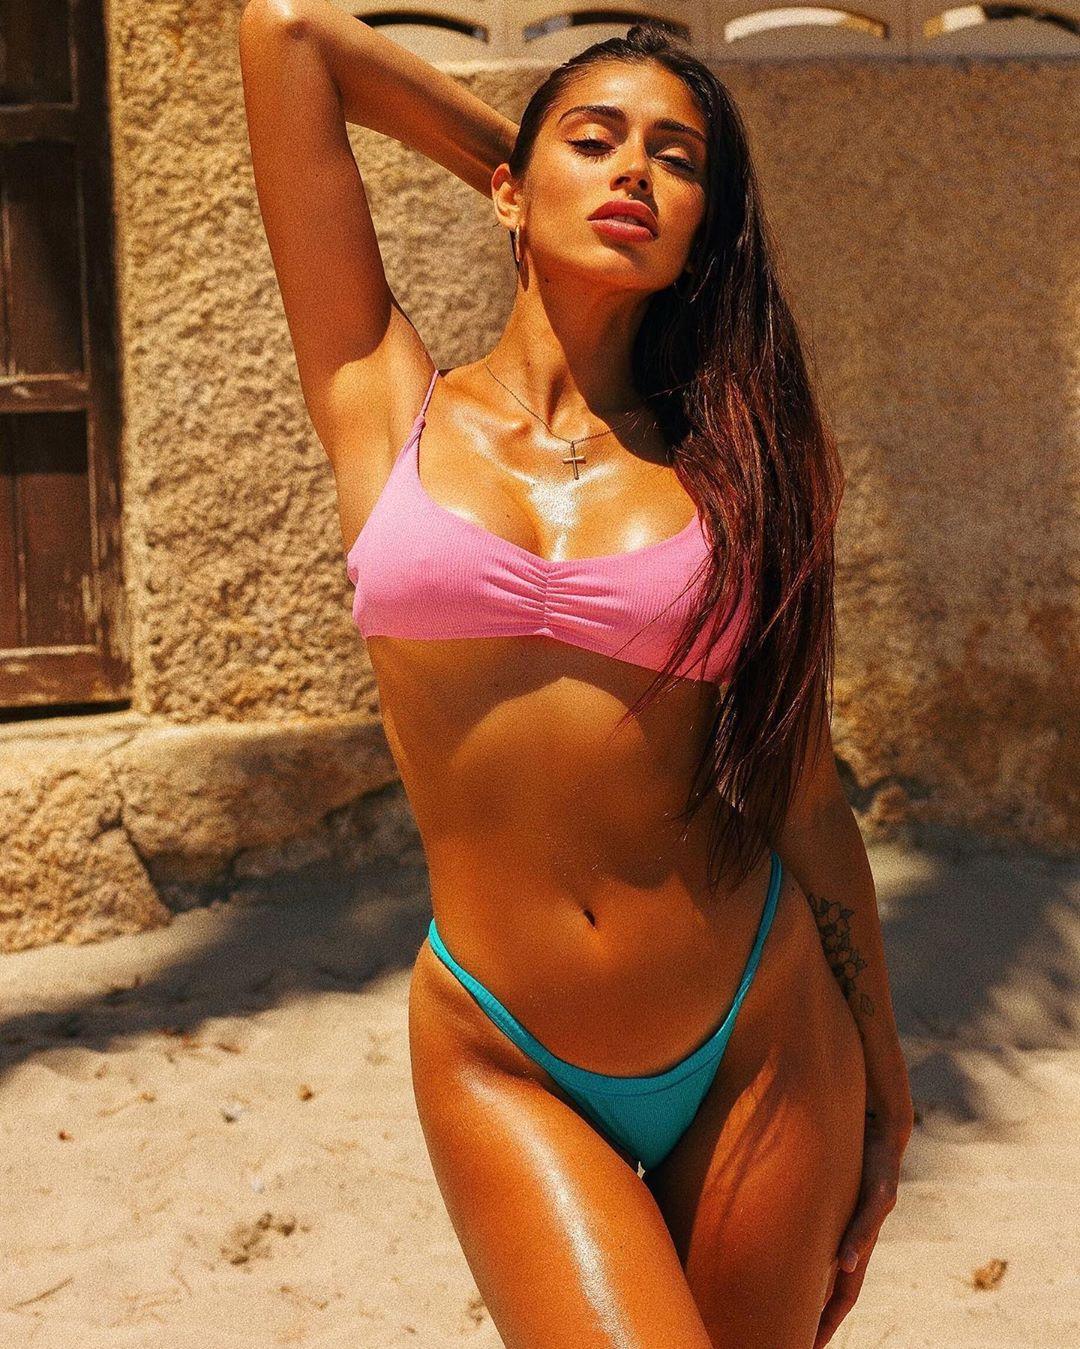 Angelina Lacour, bellissima modella argentina